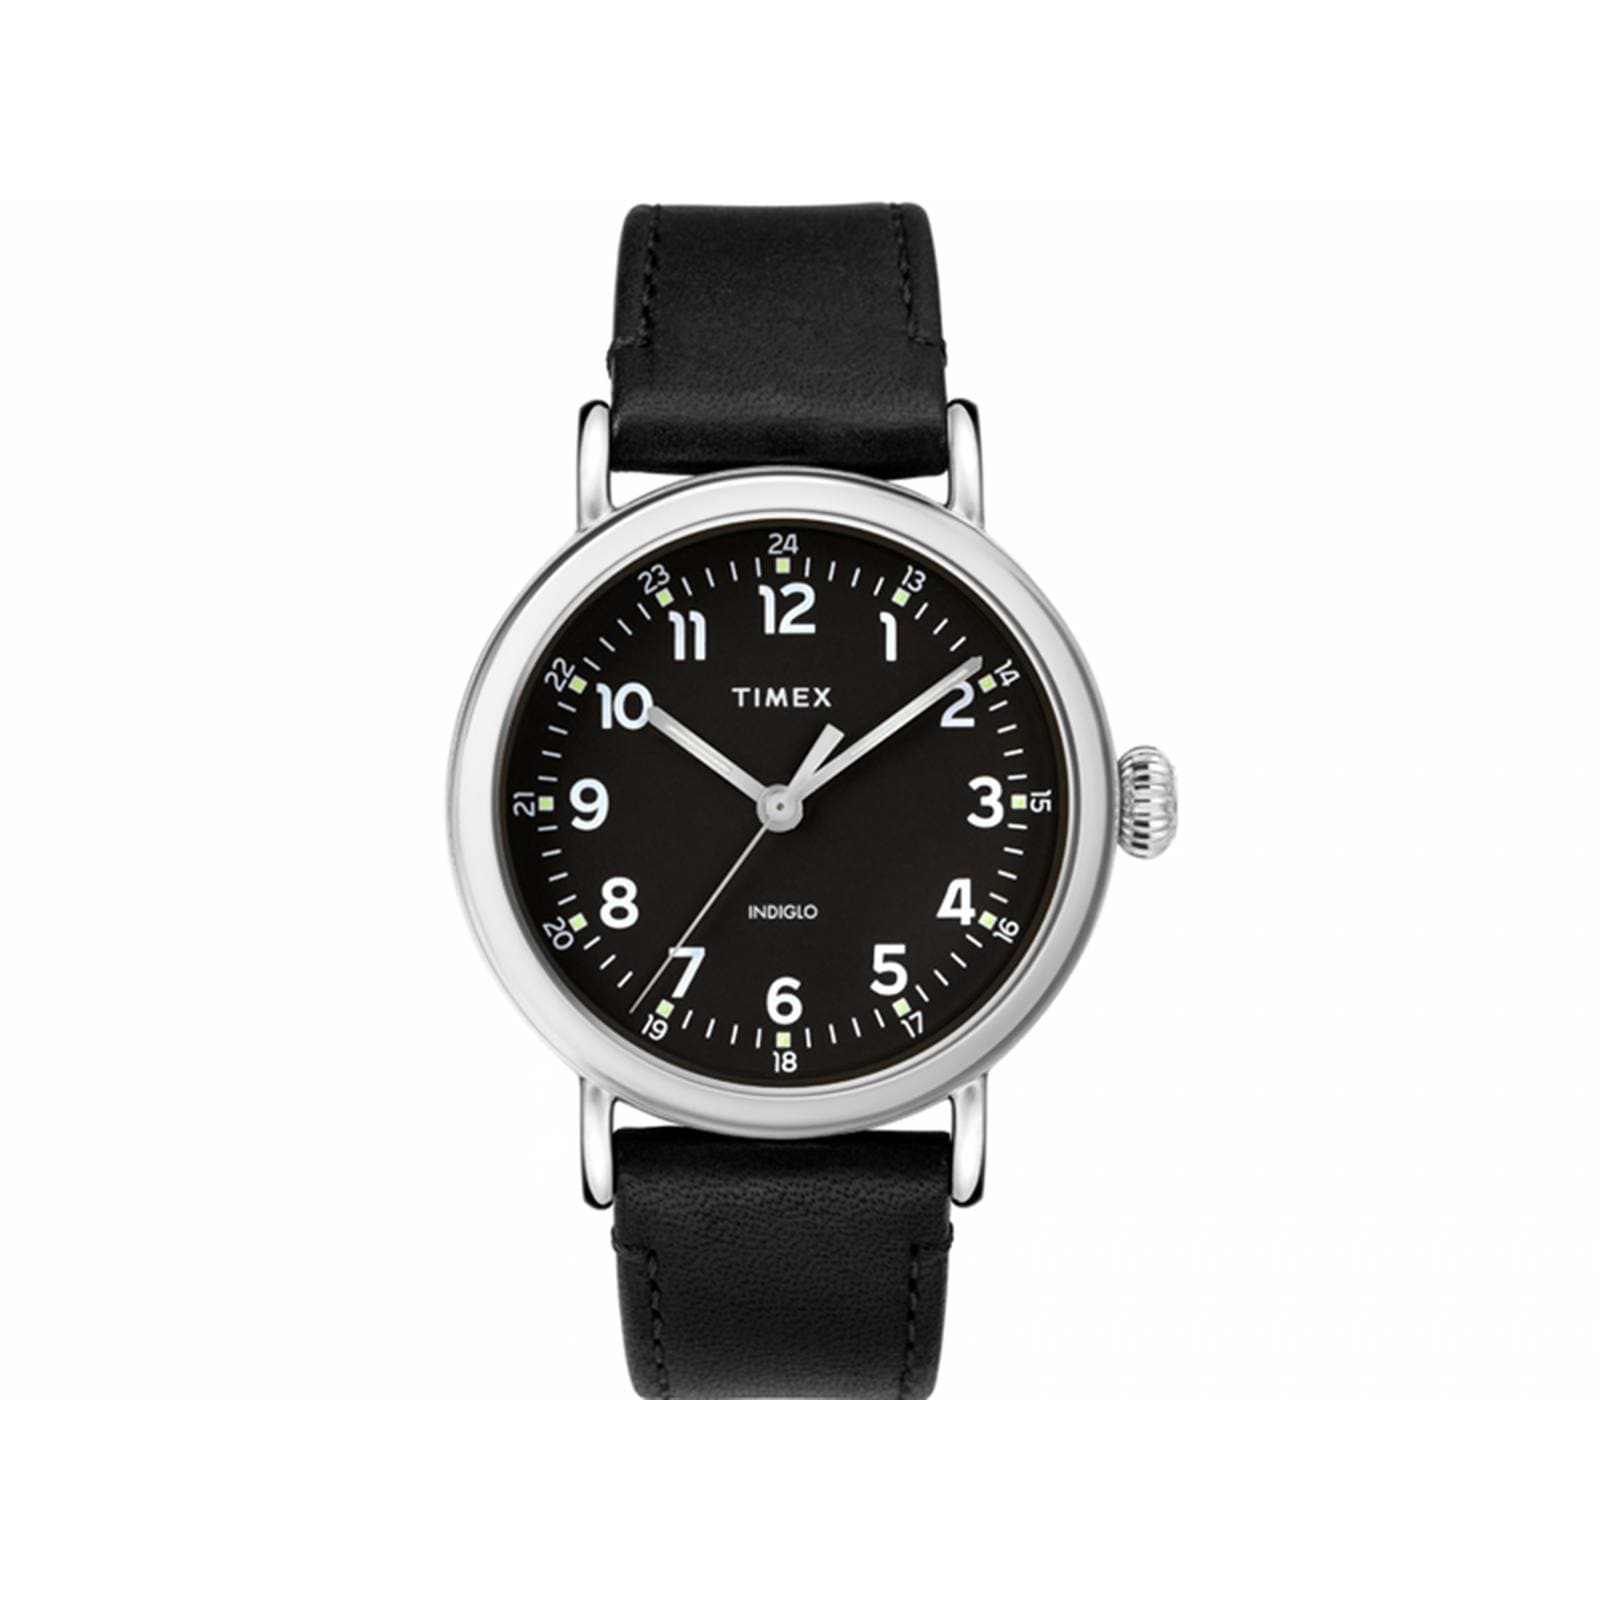 0e7988478b8e Reloj para caballero timex modelo  tw2t20200 envio gratis